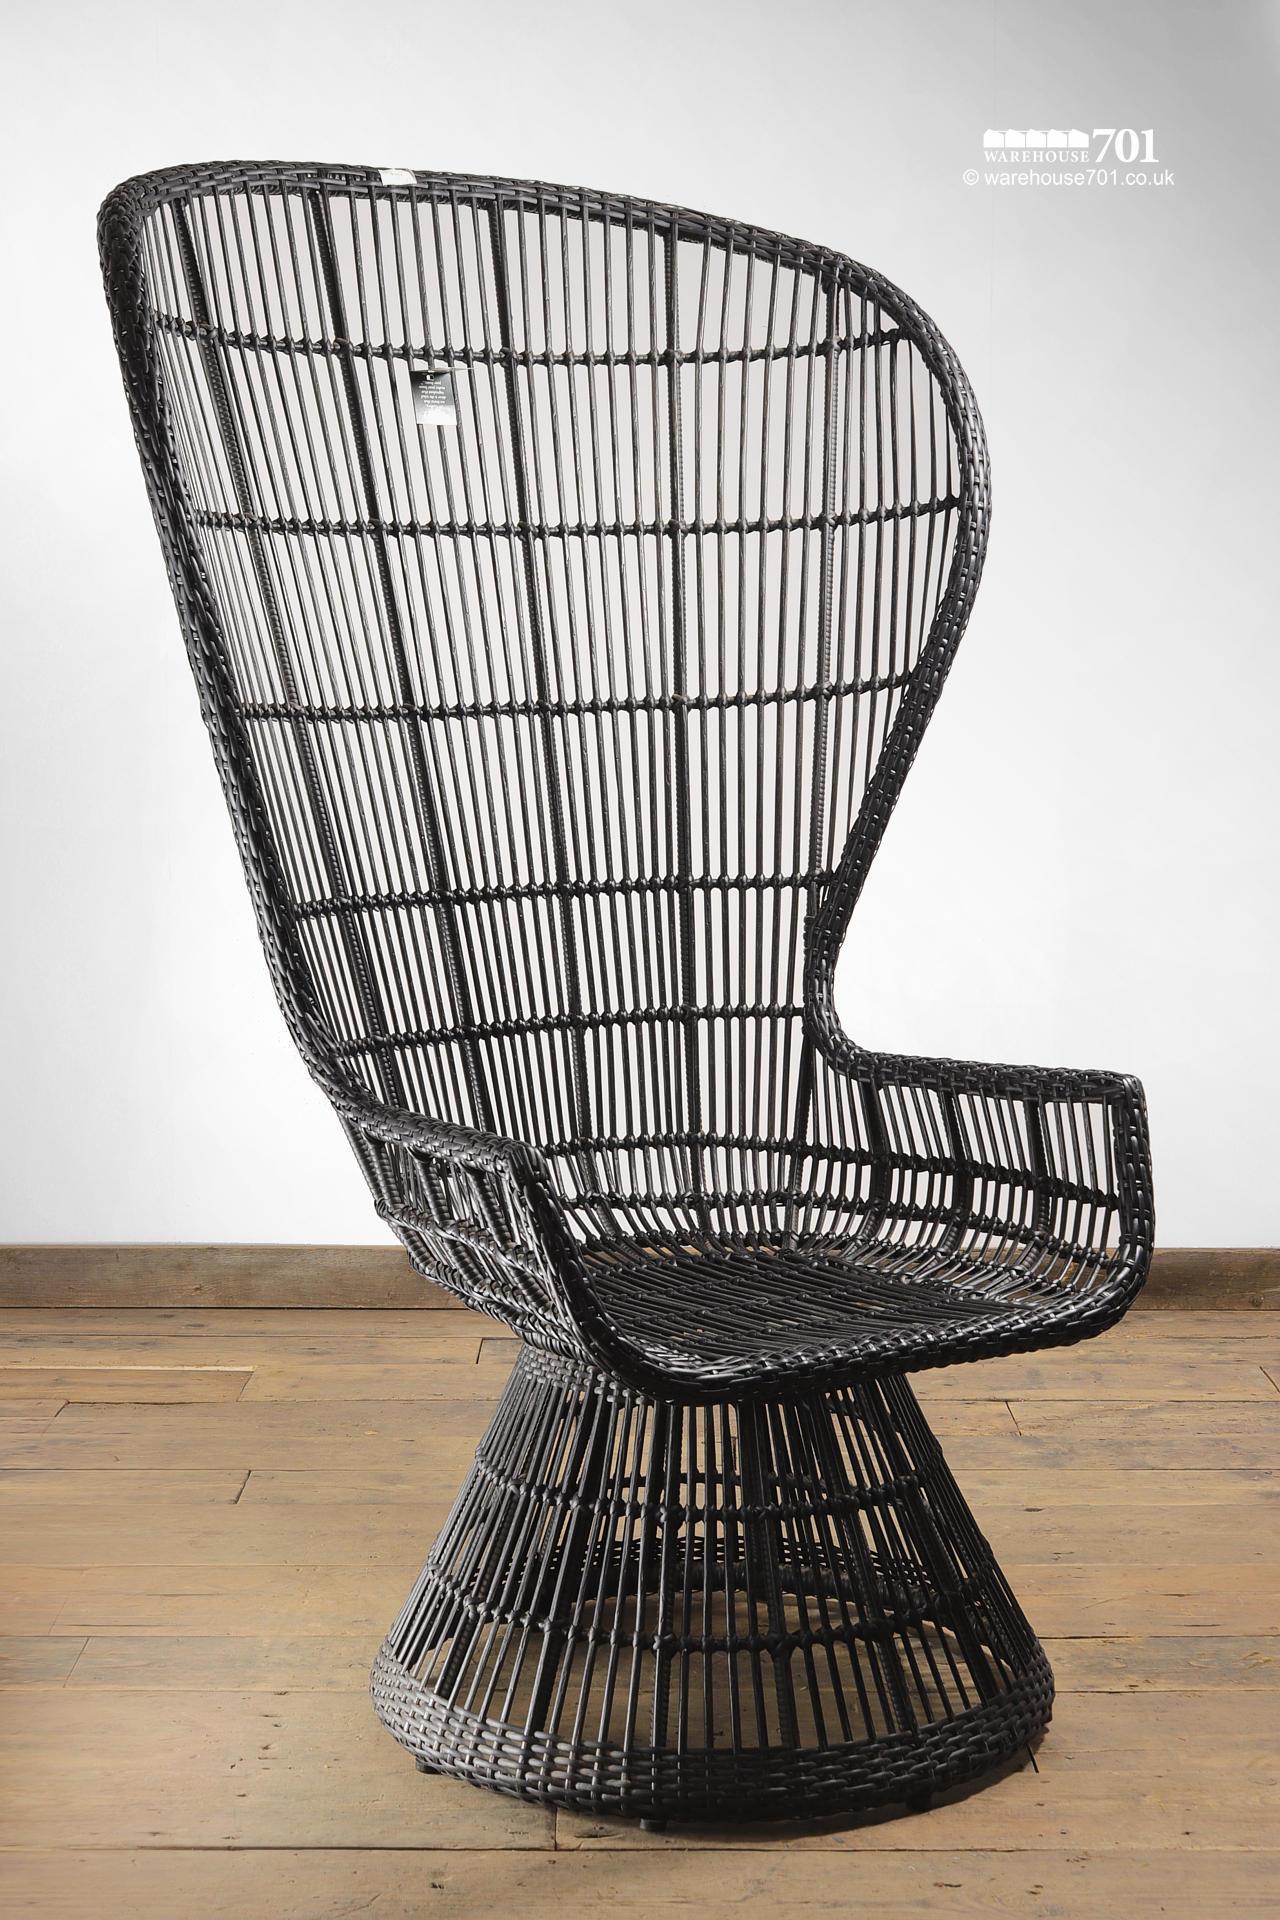 New Full Height Dark Wicker Or Rattan High Back Peacock Chair